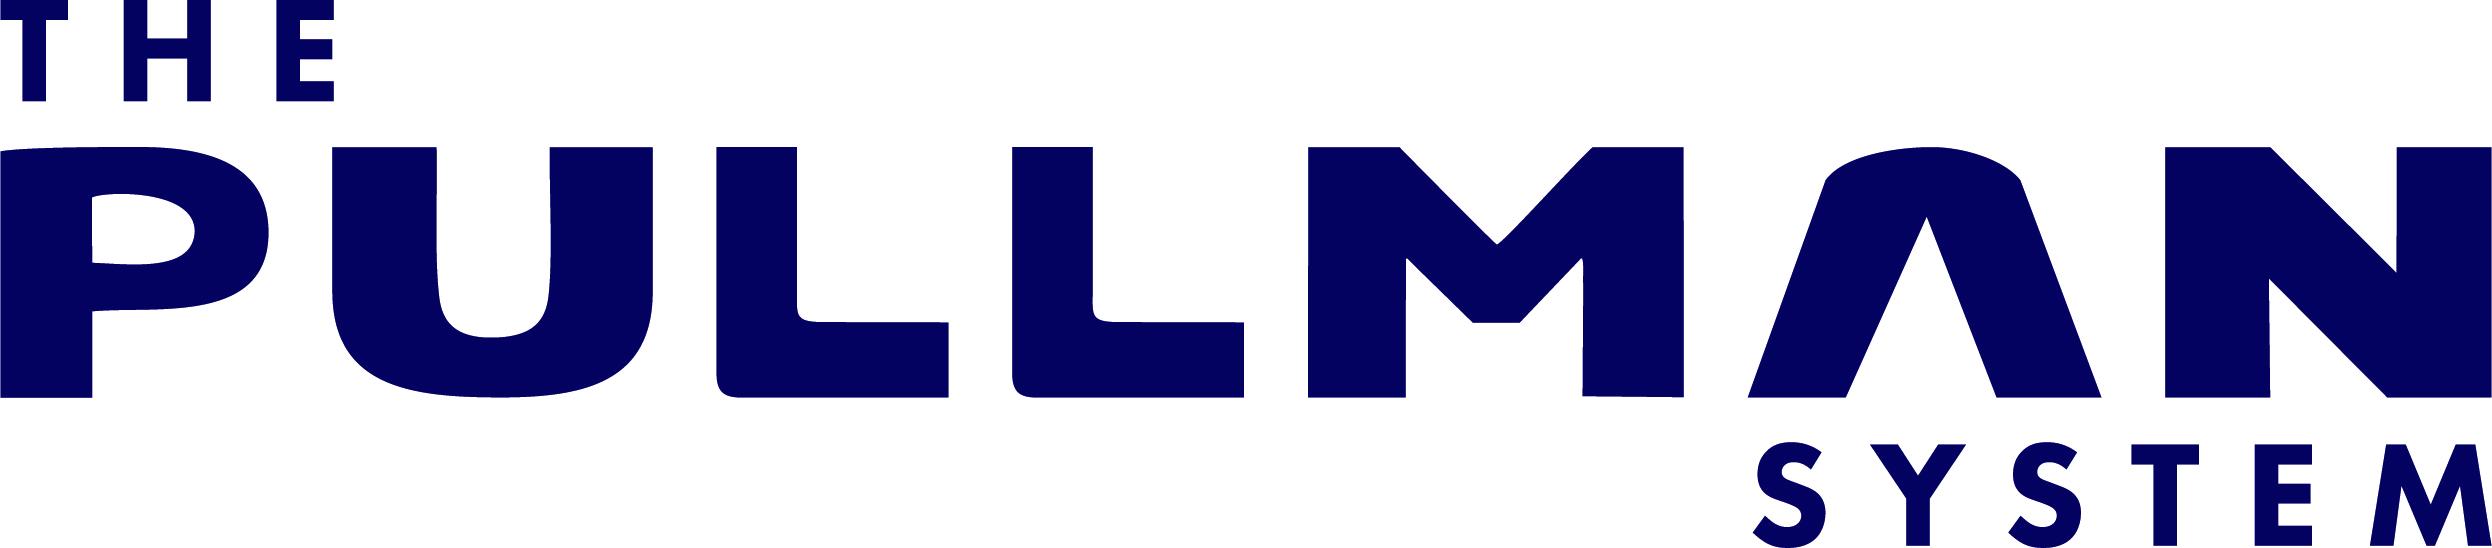 Logo - The Pullman System.jpg